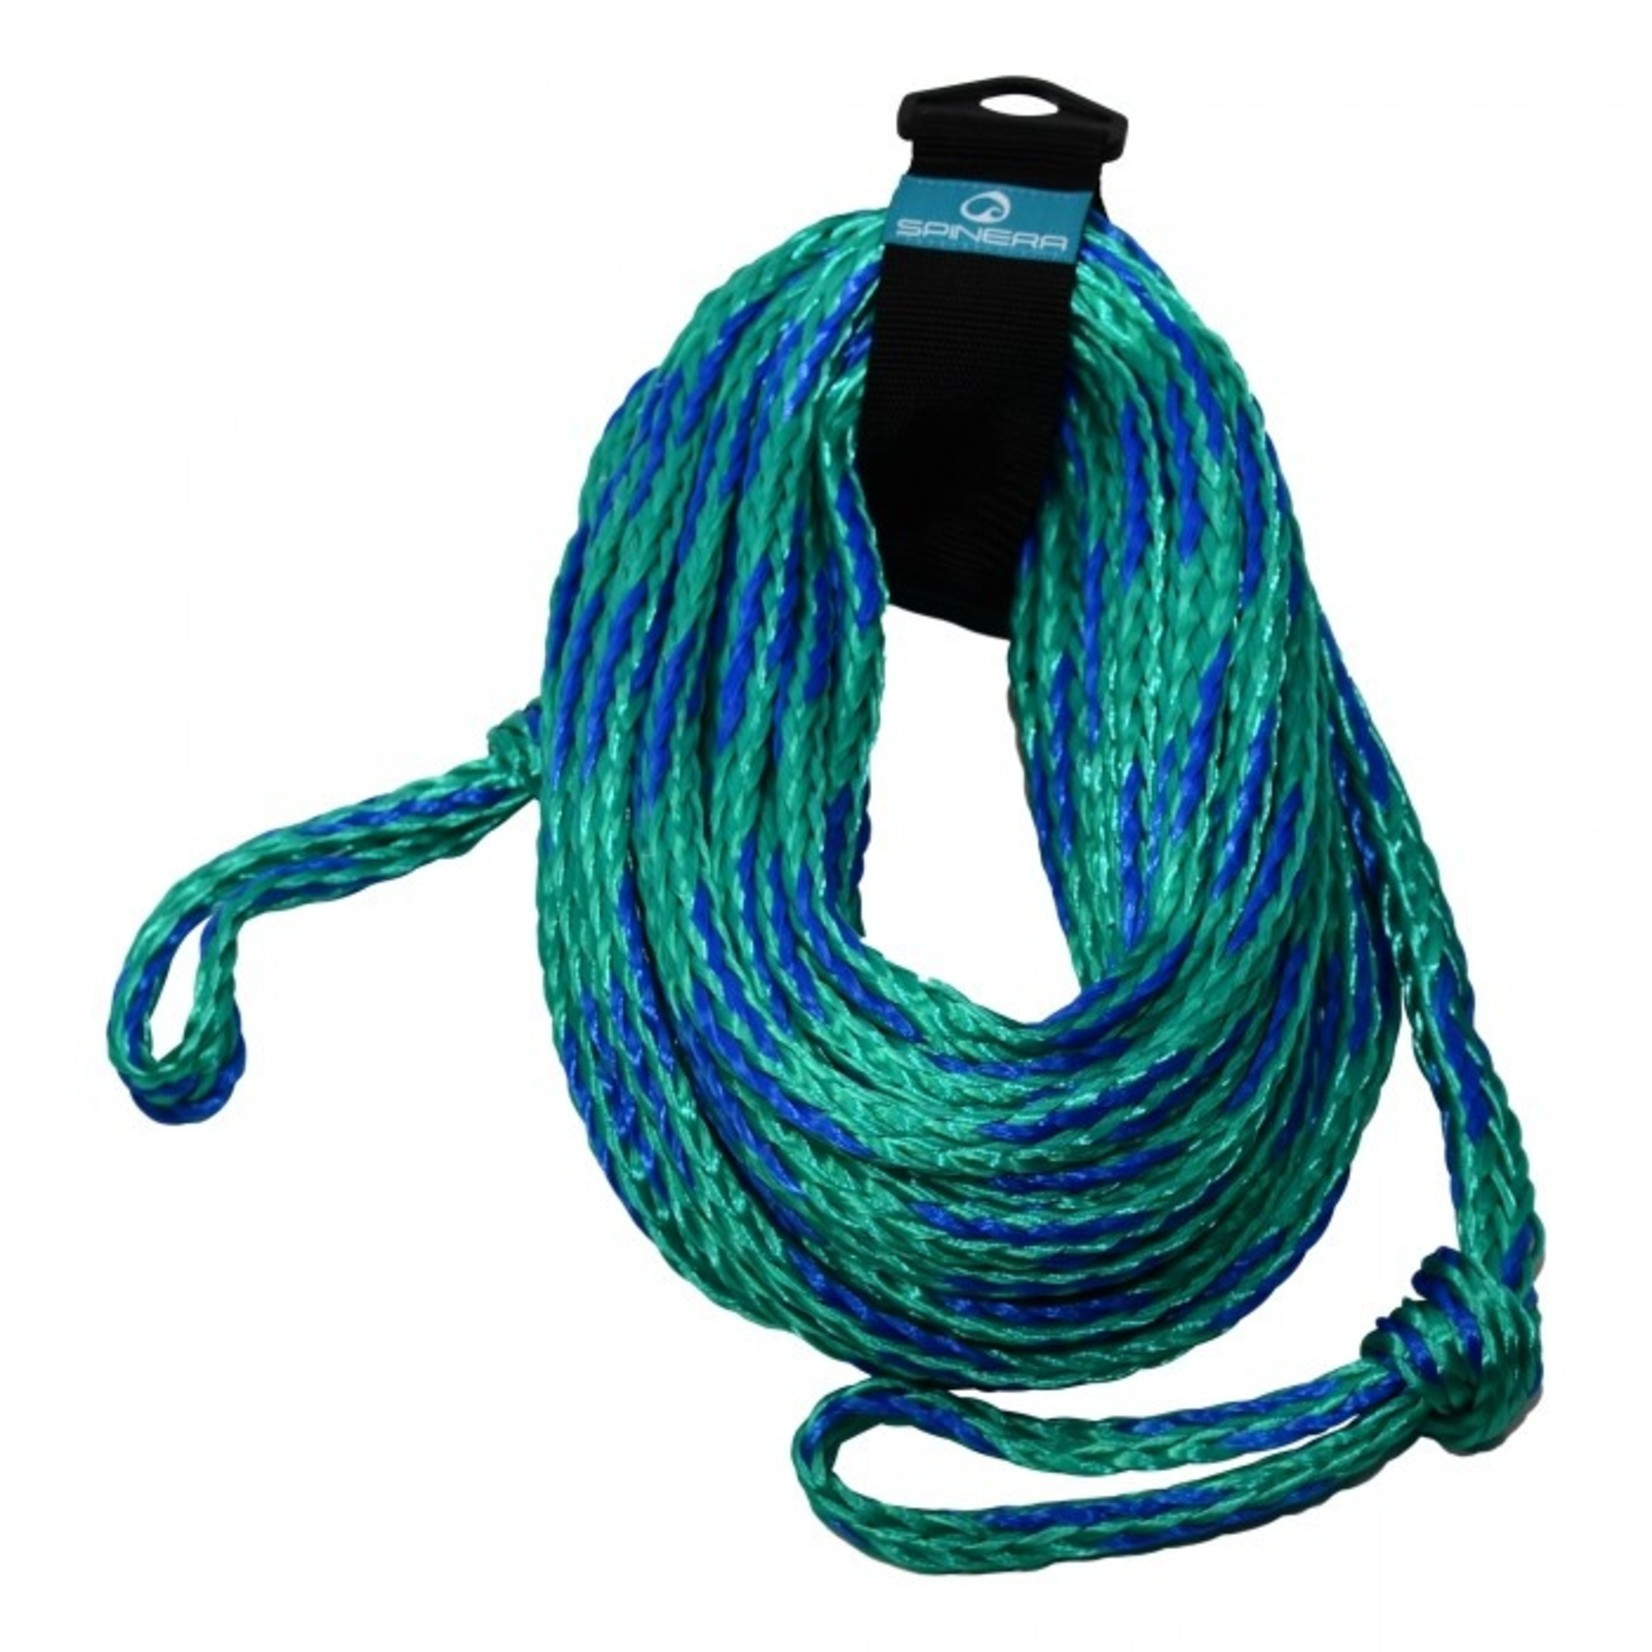 Towable Rope 4 - Vierpersoons